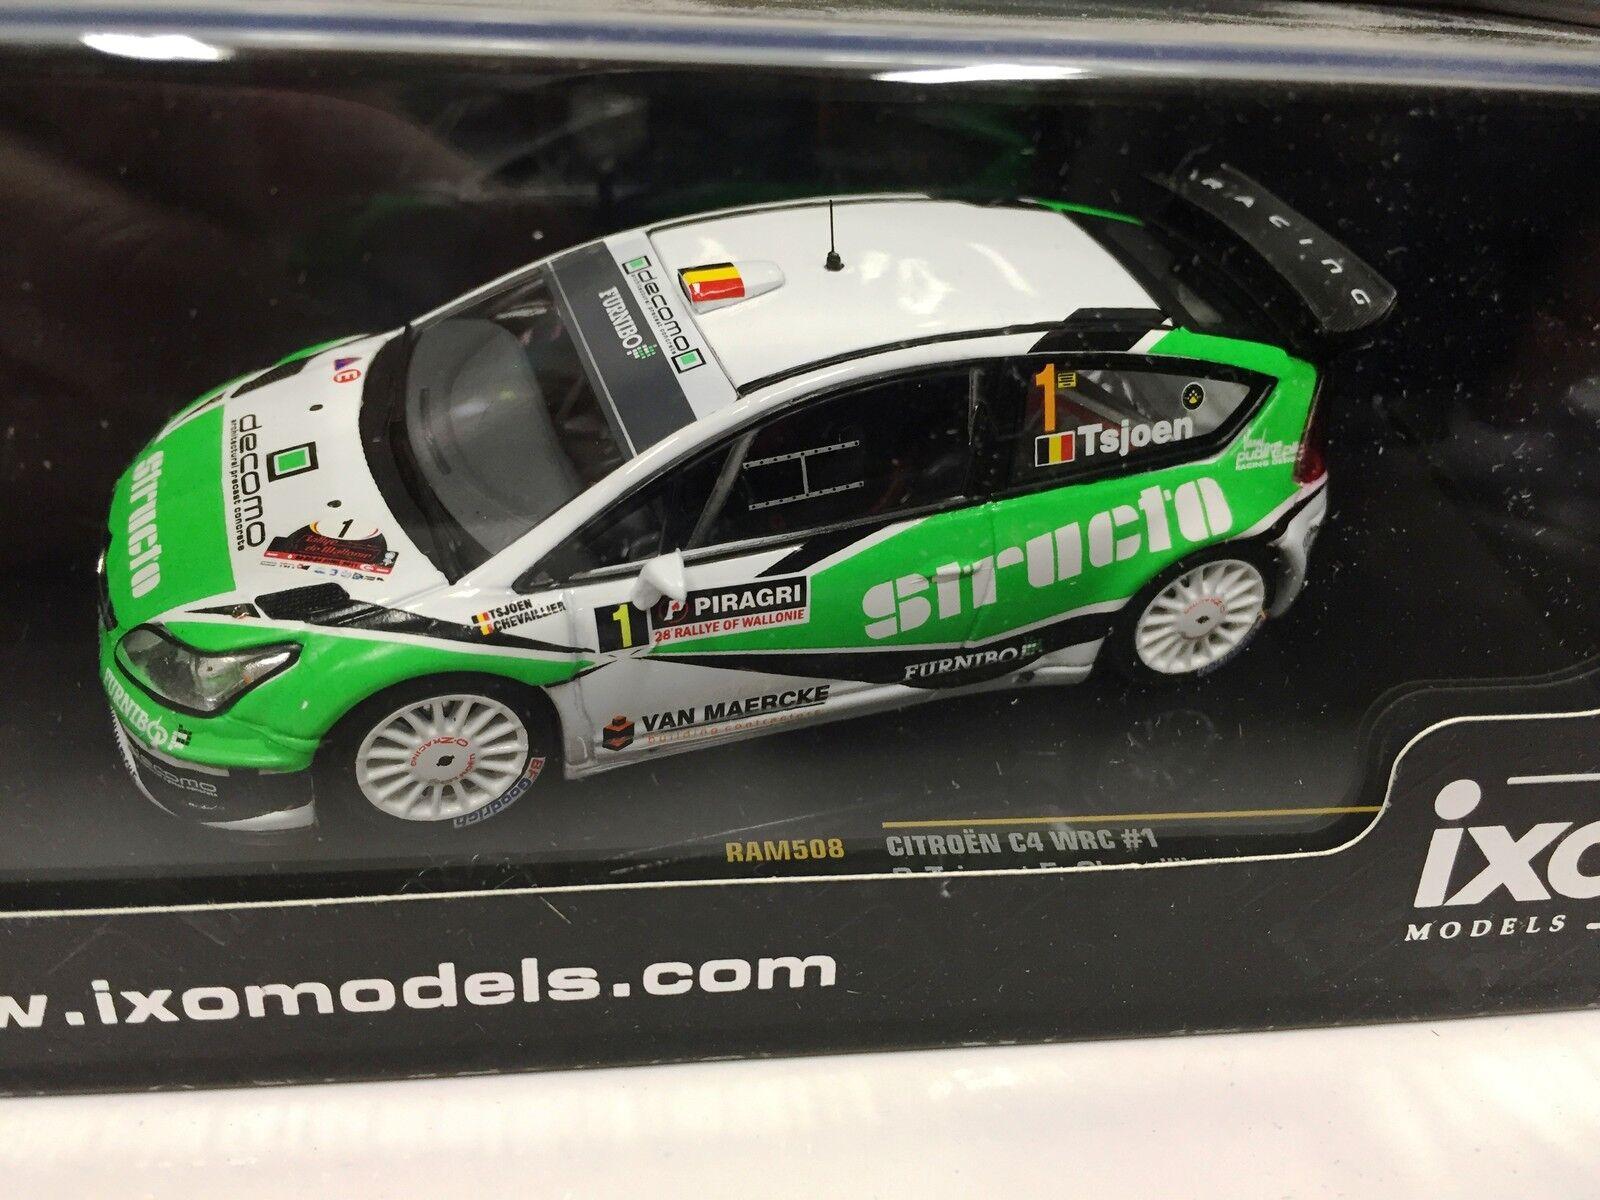 CITROEN C4 WRC  1 TSJOEN- R.WALLONIE 2011- 1 43 IXO VOITURE DIECAST-RAM508